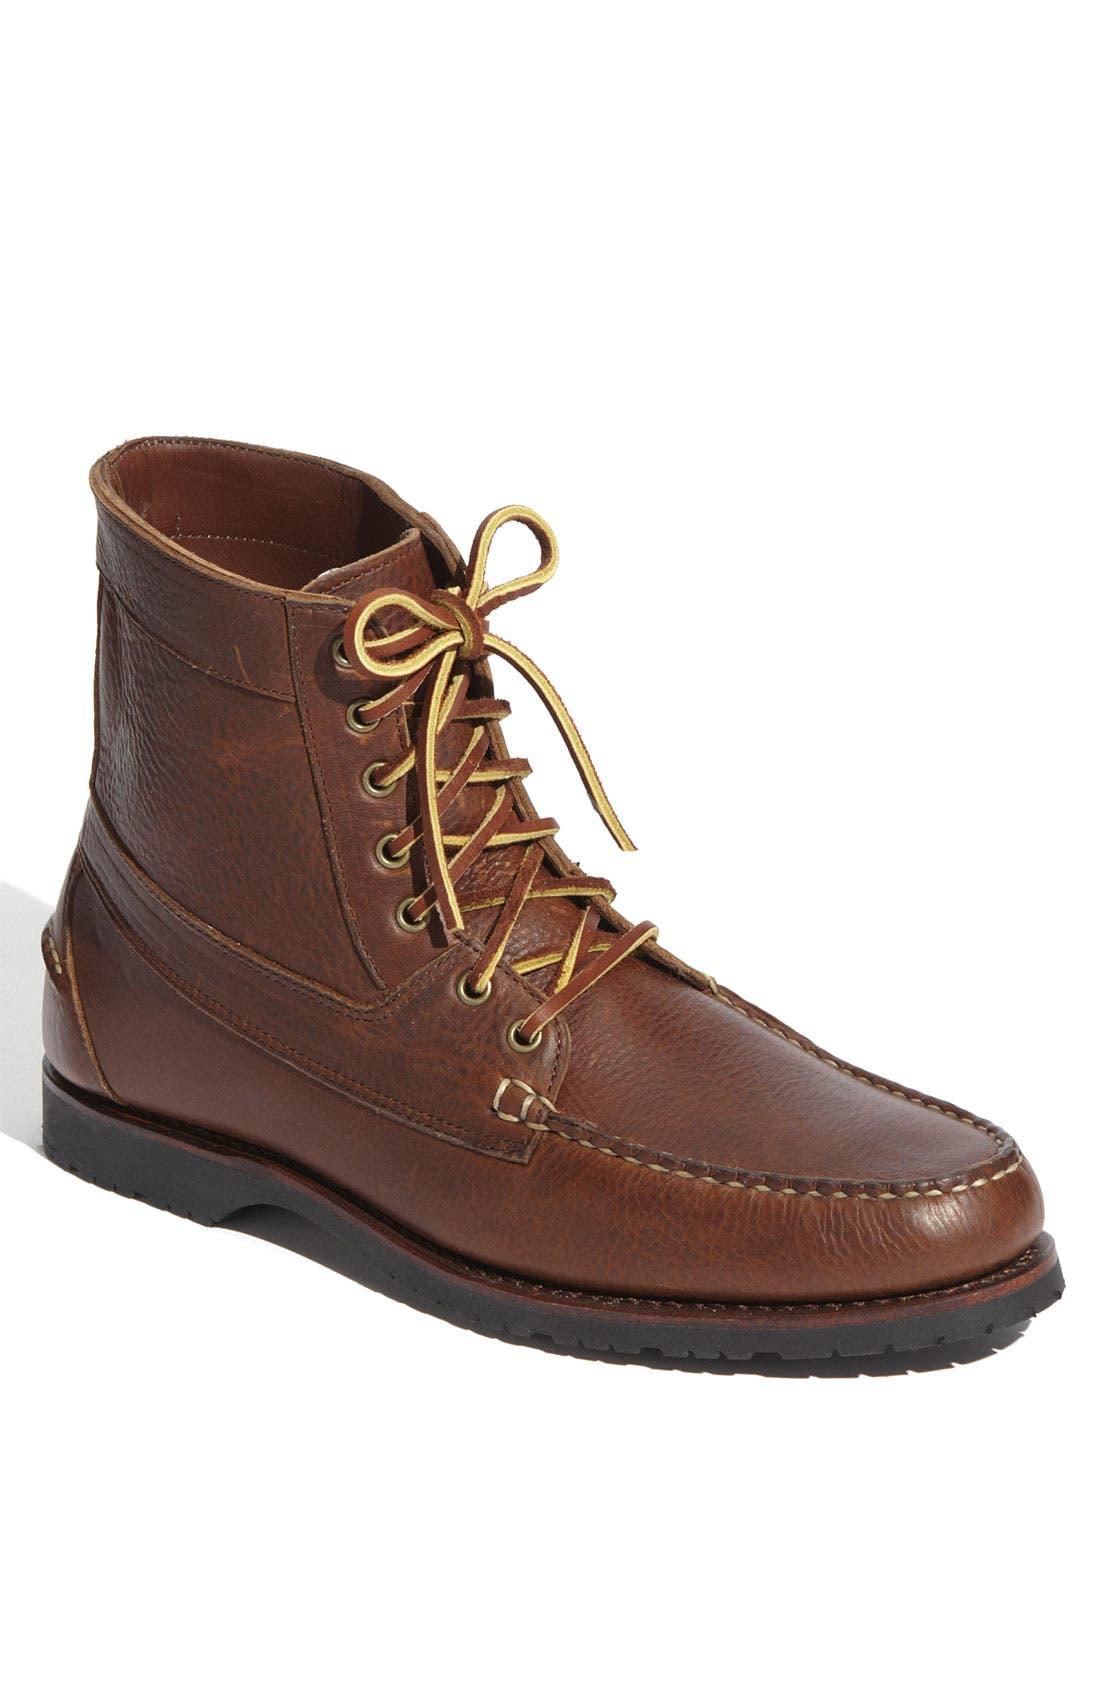 Alternate Image 1 Selected - Allen Edmonds 'Yuma' Boot